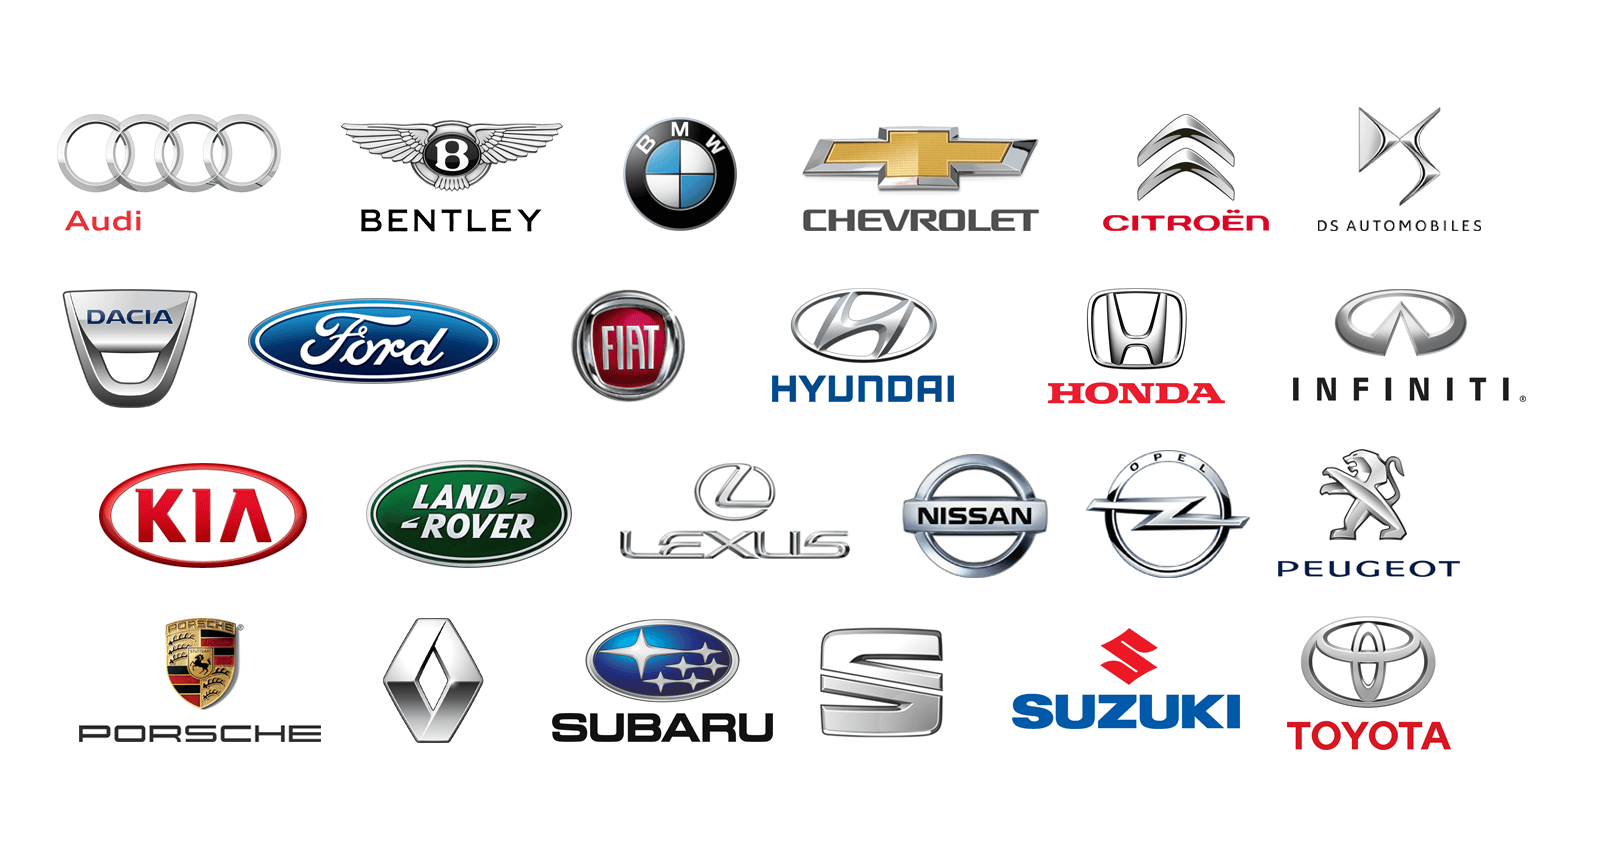 marcas de coches a qu grupo automovil stivo pertenece